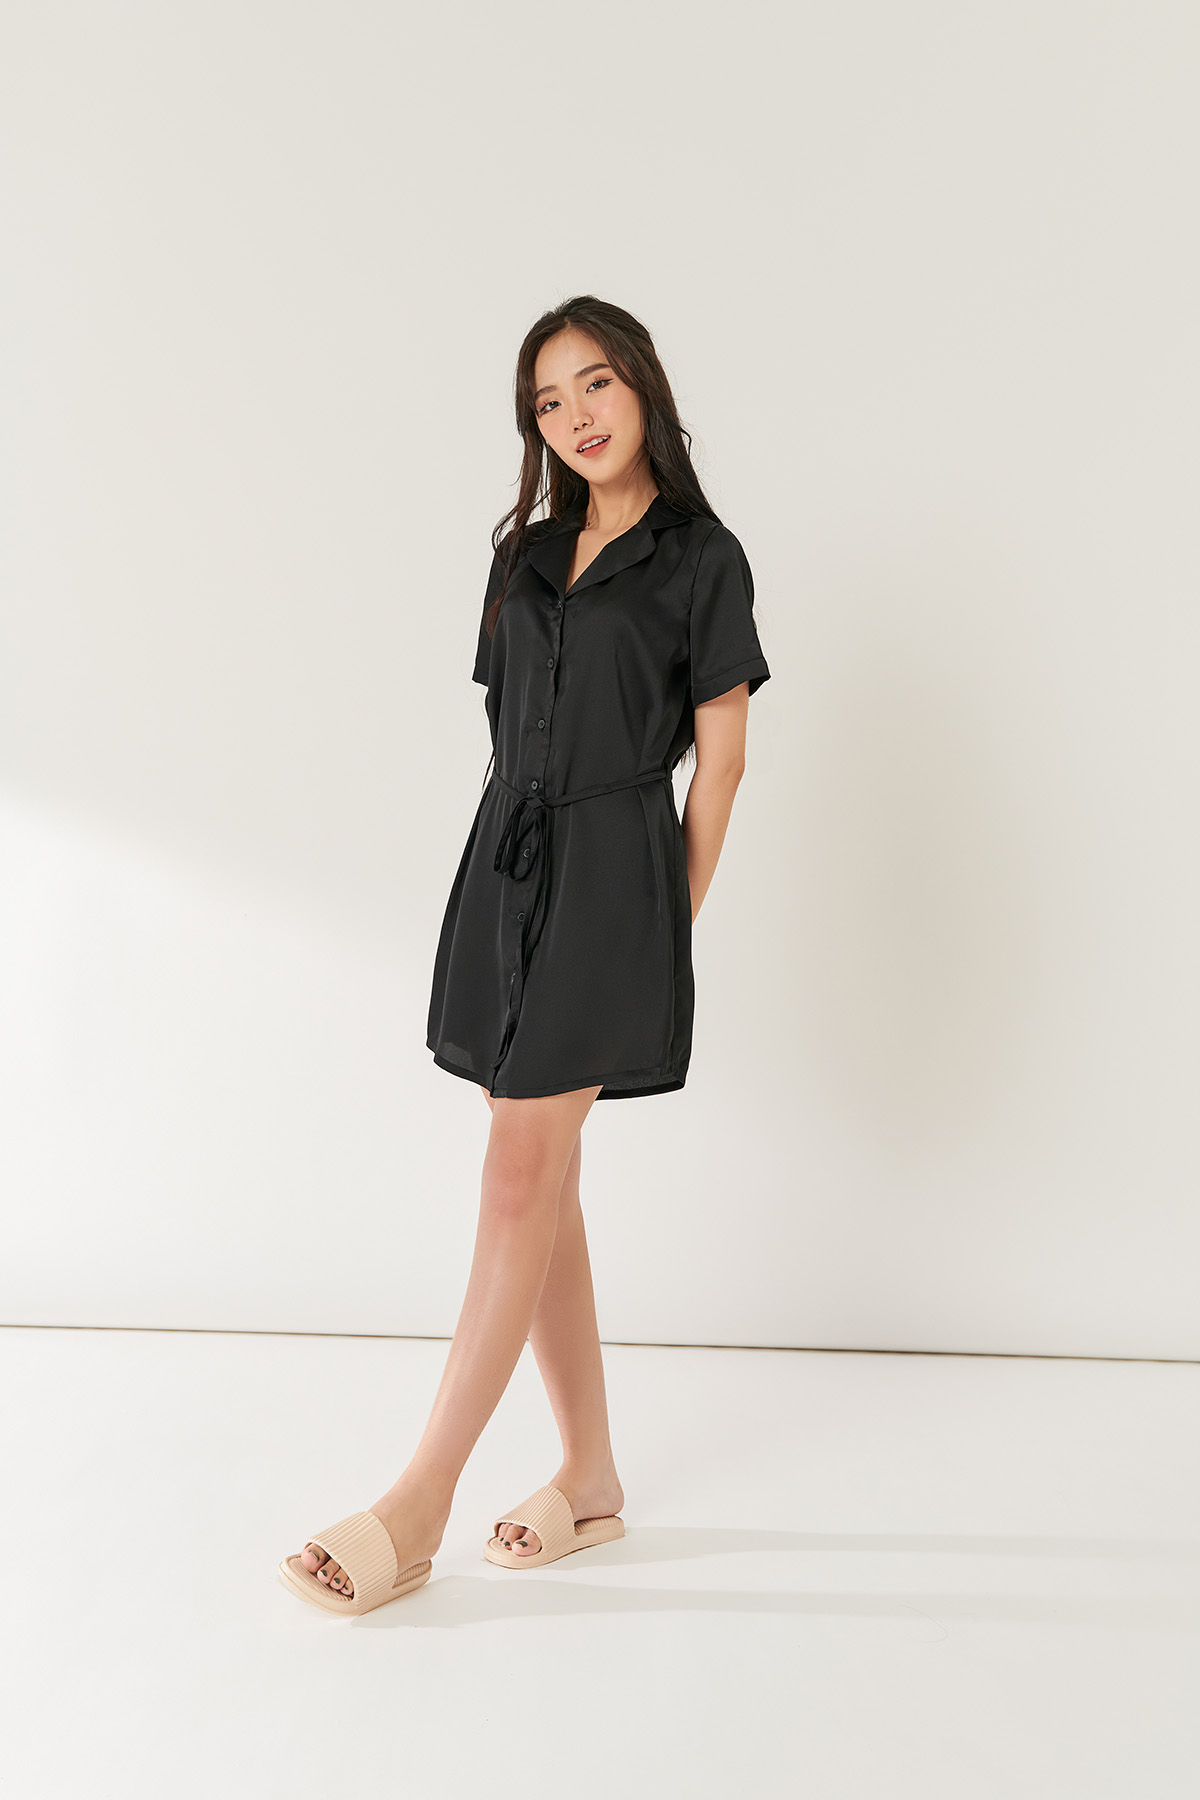 Đầm suông cổ danton đen - Black notched shift dress